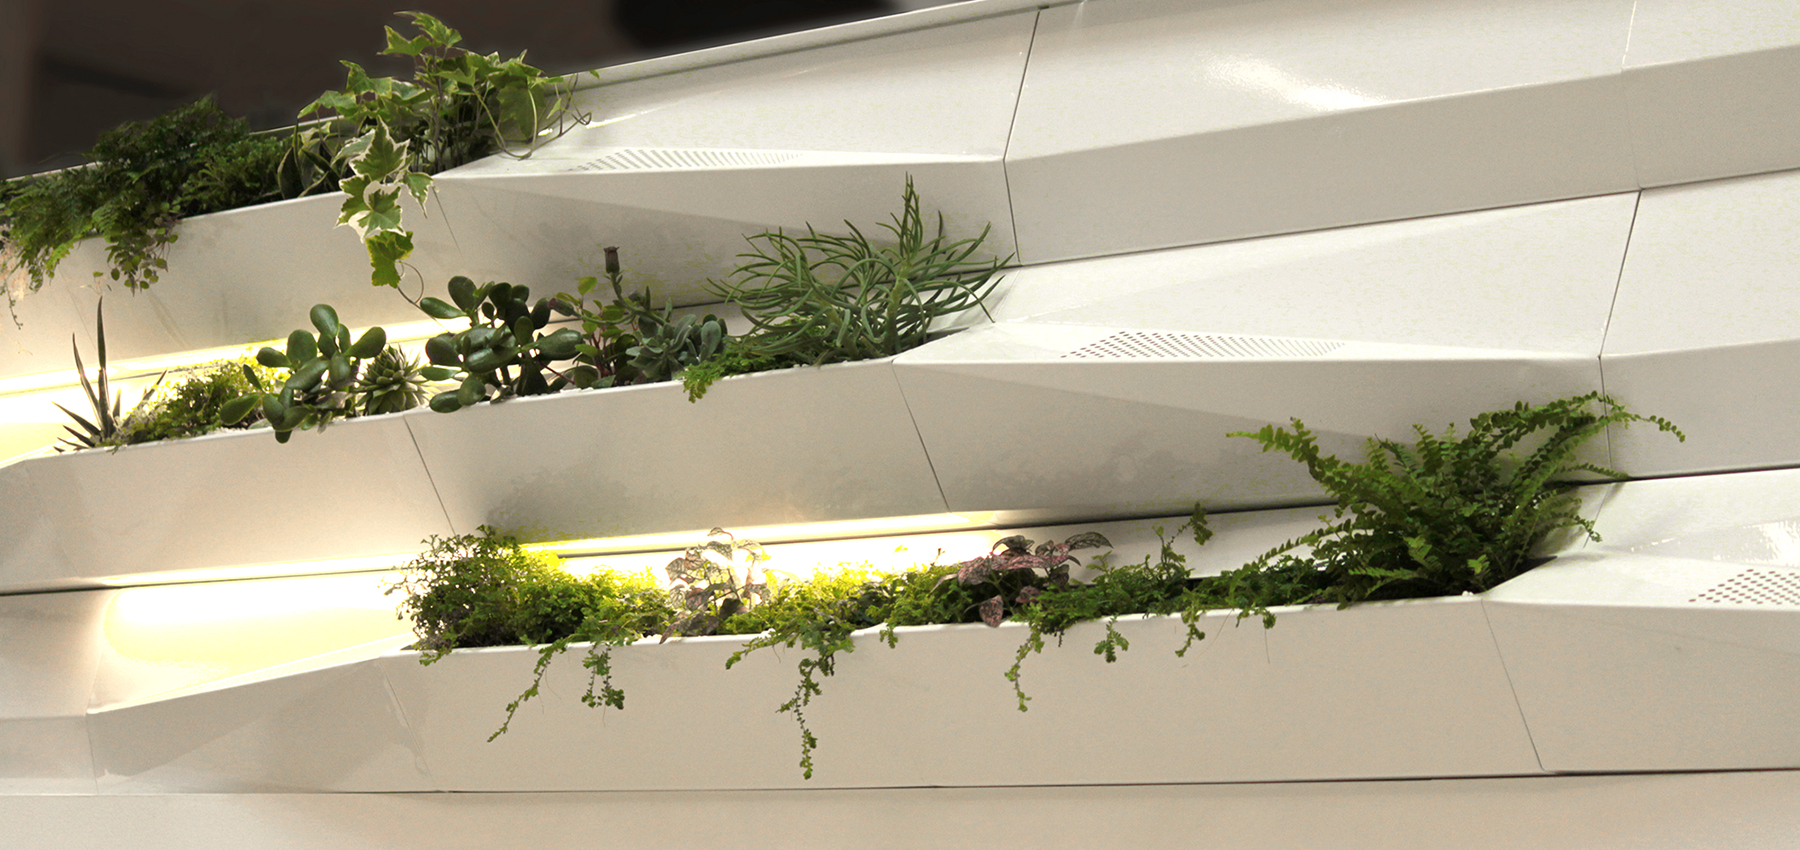 Botanica breathing wall